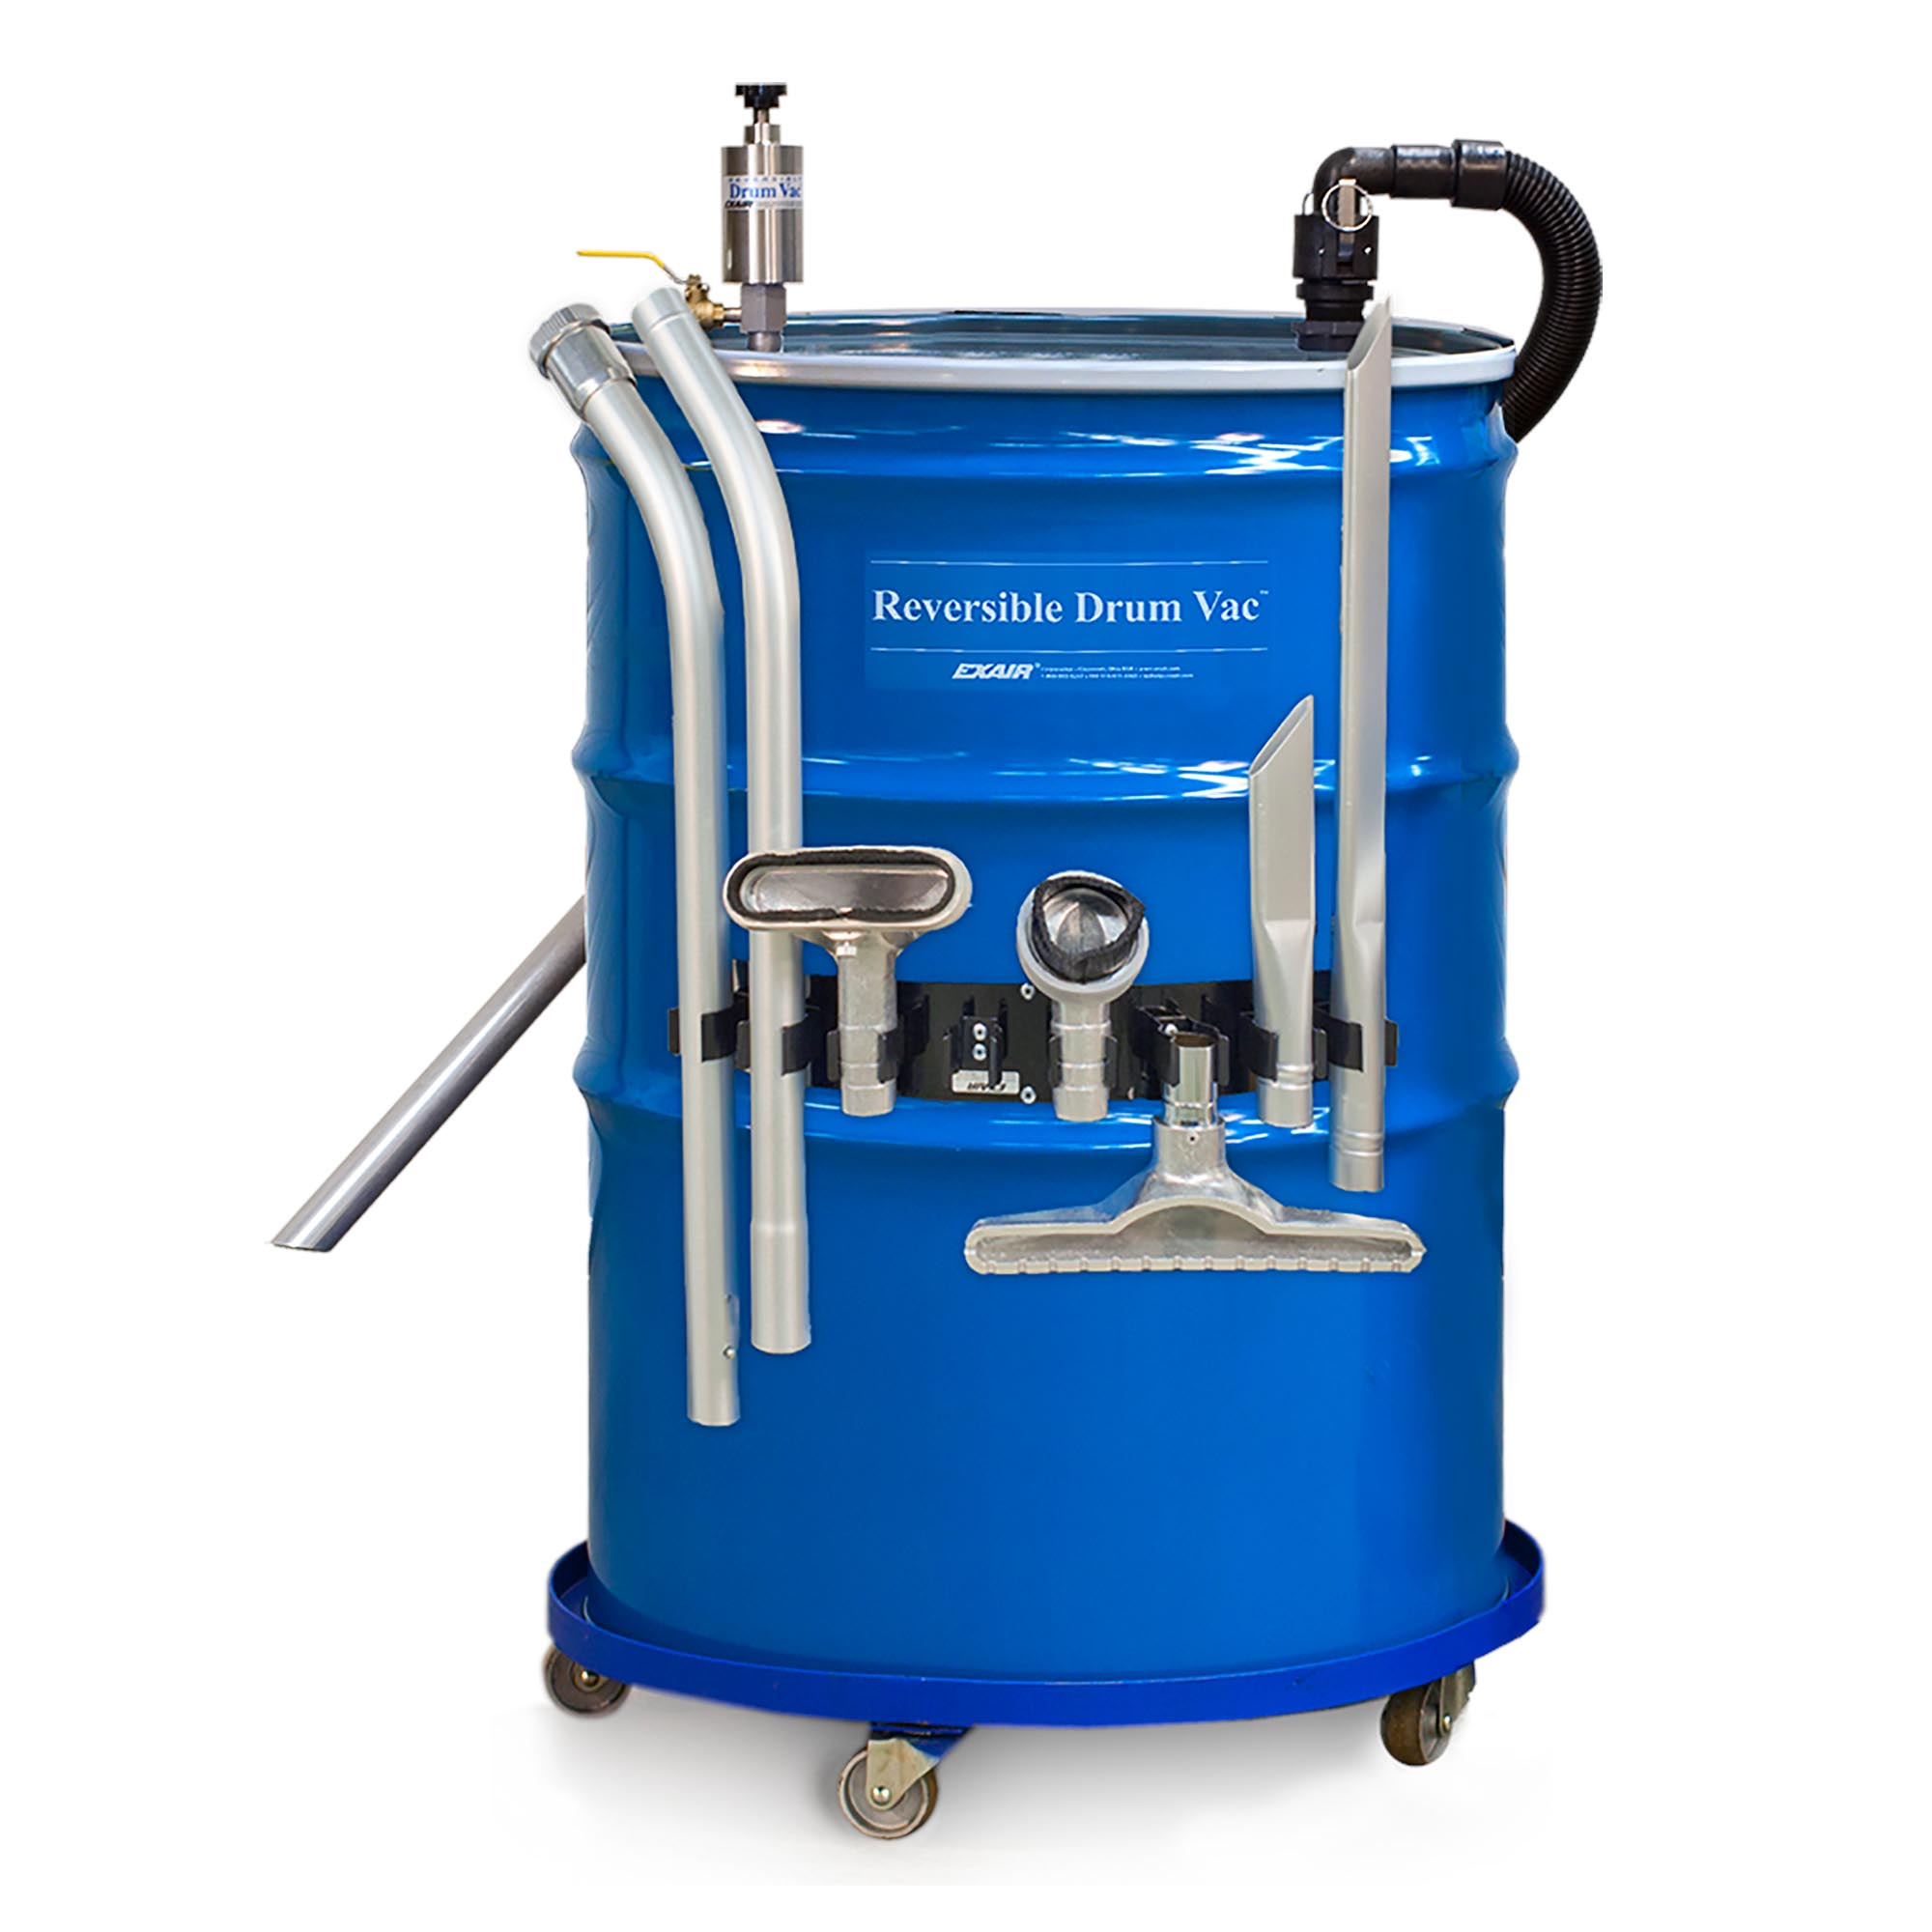 Model 6396-110 110 Gallon Premium Reversible Drum Vac System